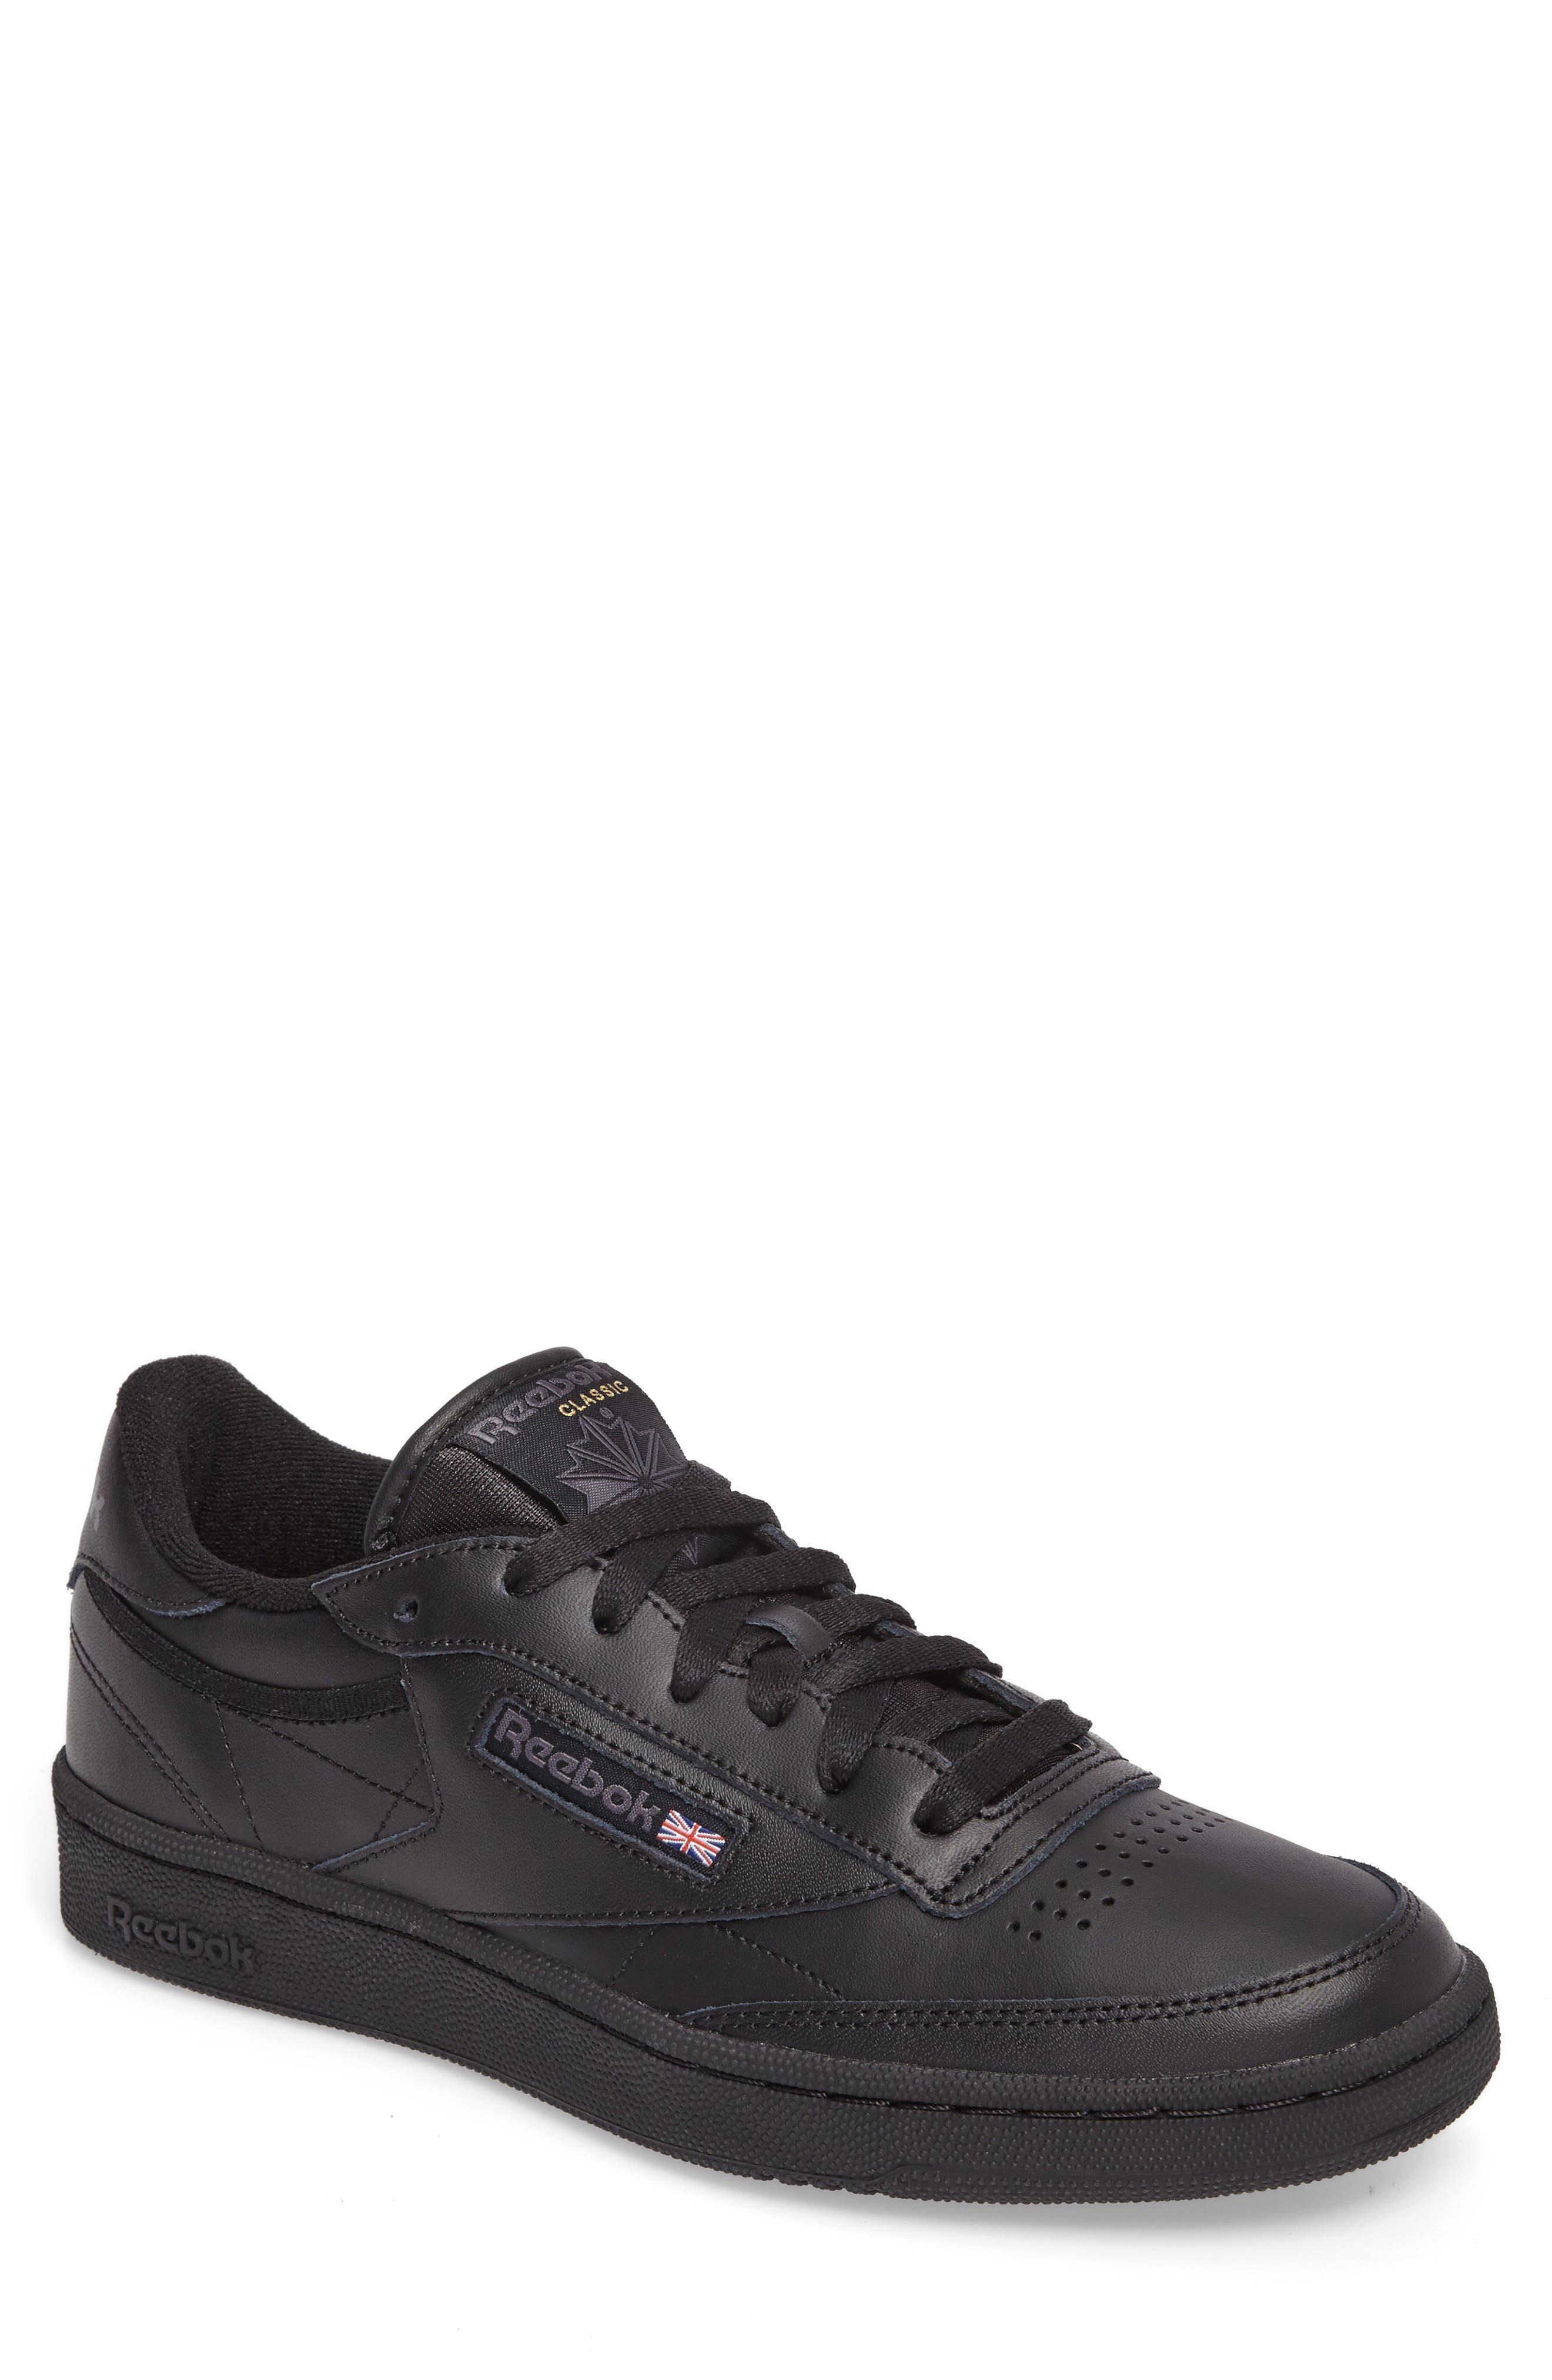 Club C 85 Sneaker,                             Main thumbnail 1, color,                             BLACK/ CHARCOAL